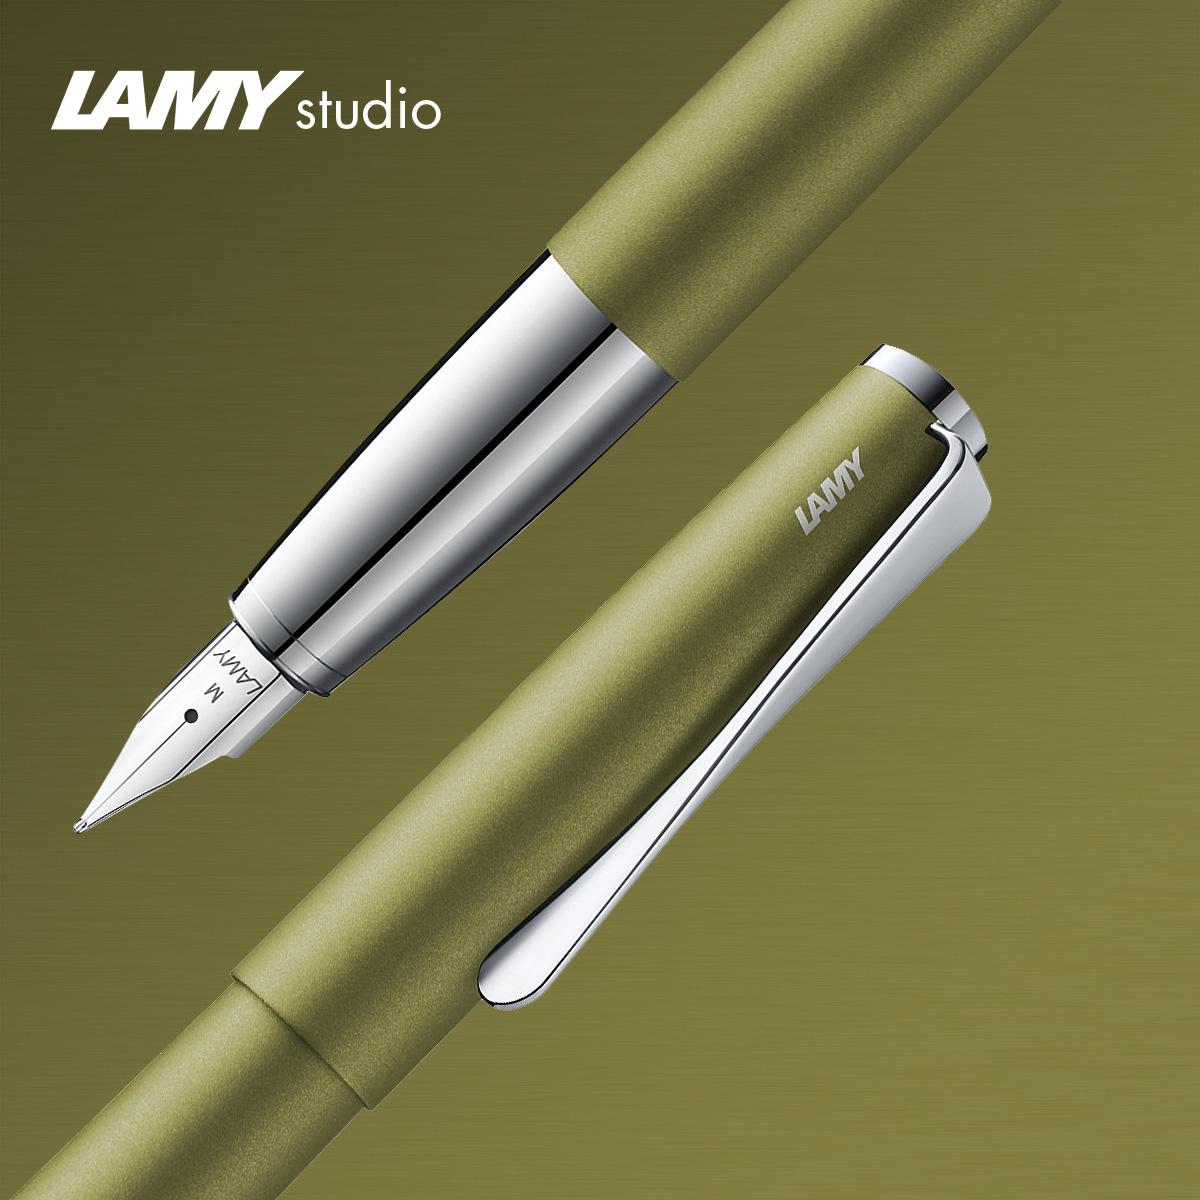 Lamy studio-olive green-1200px.jpg